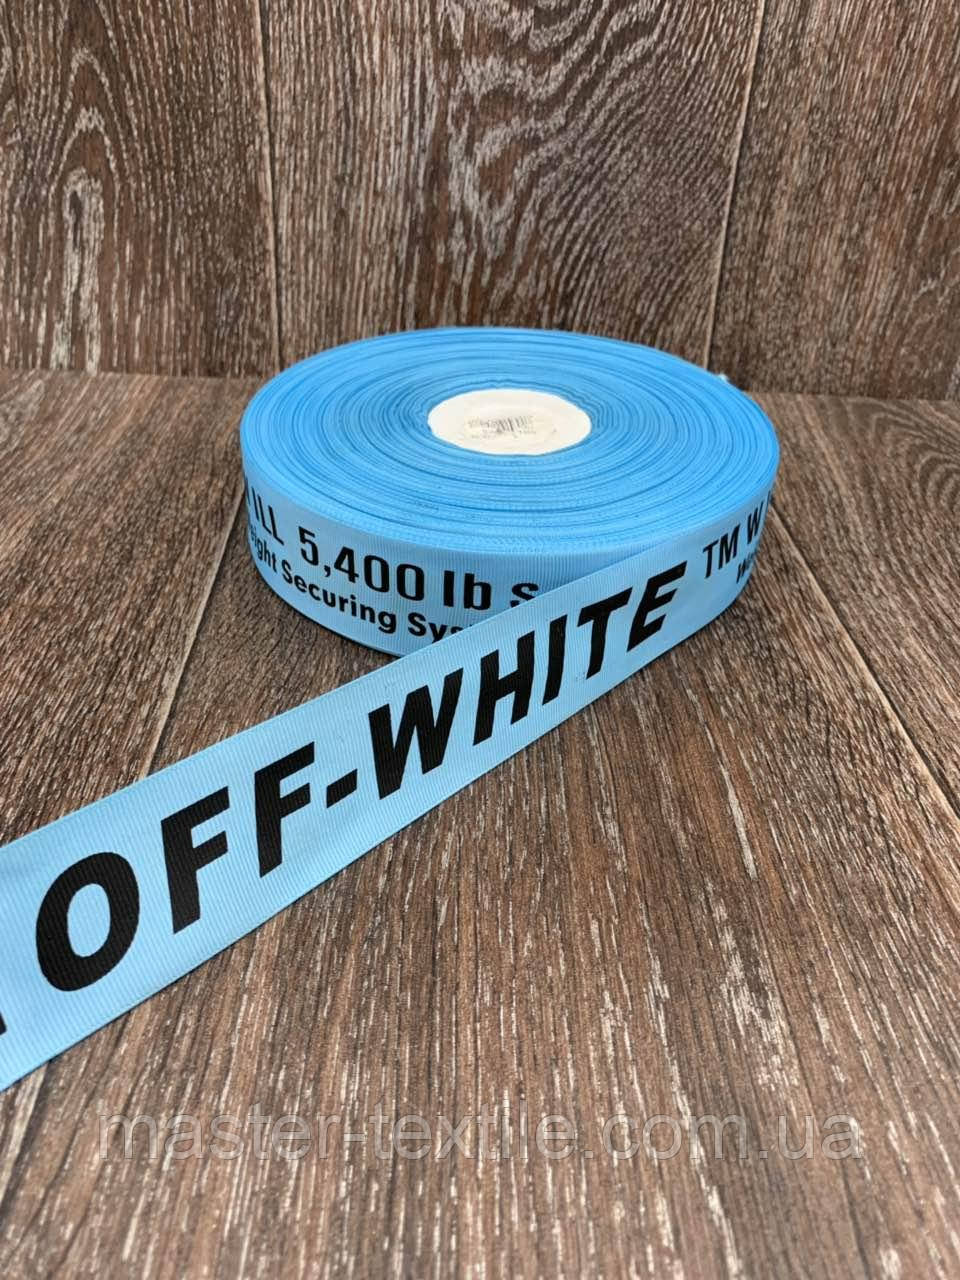 Стрічка респ з написом OFF-WHITE блакитна 100 ярд, ширина 4 см